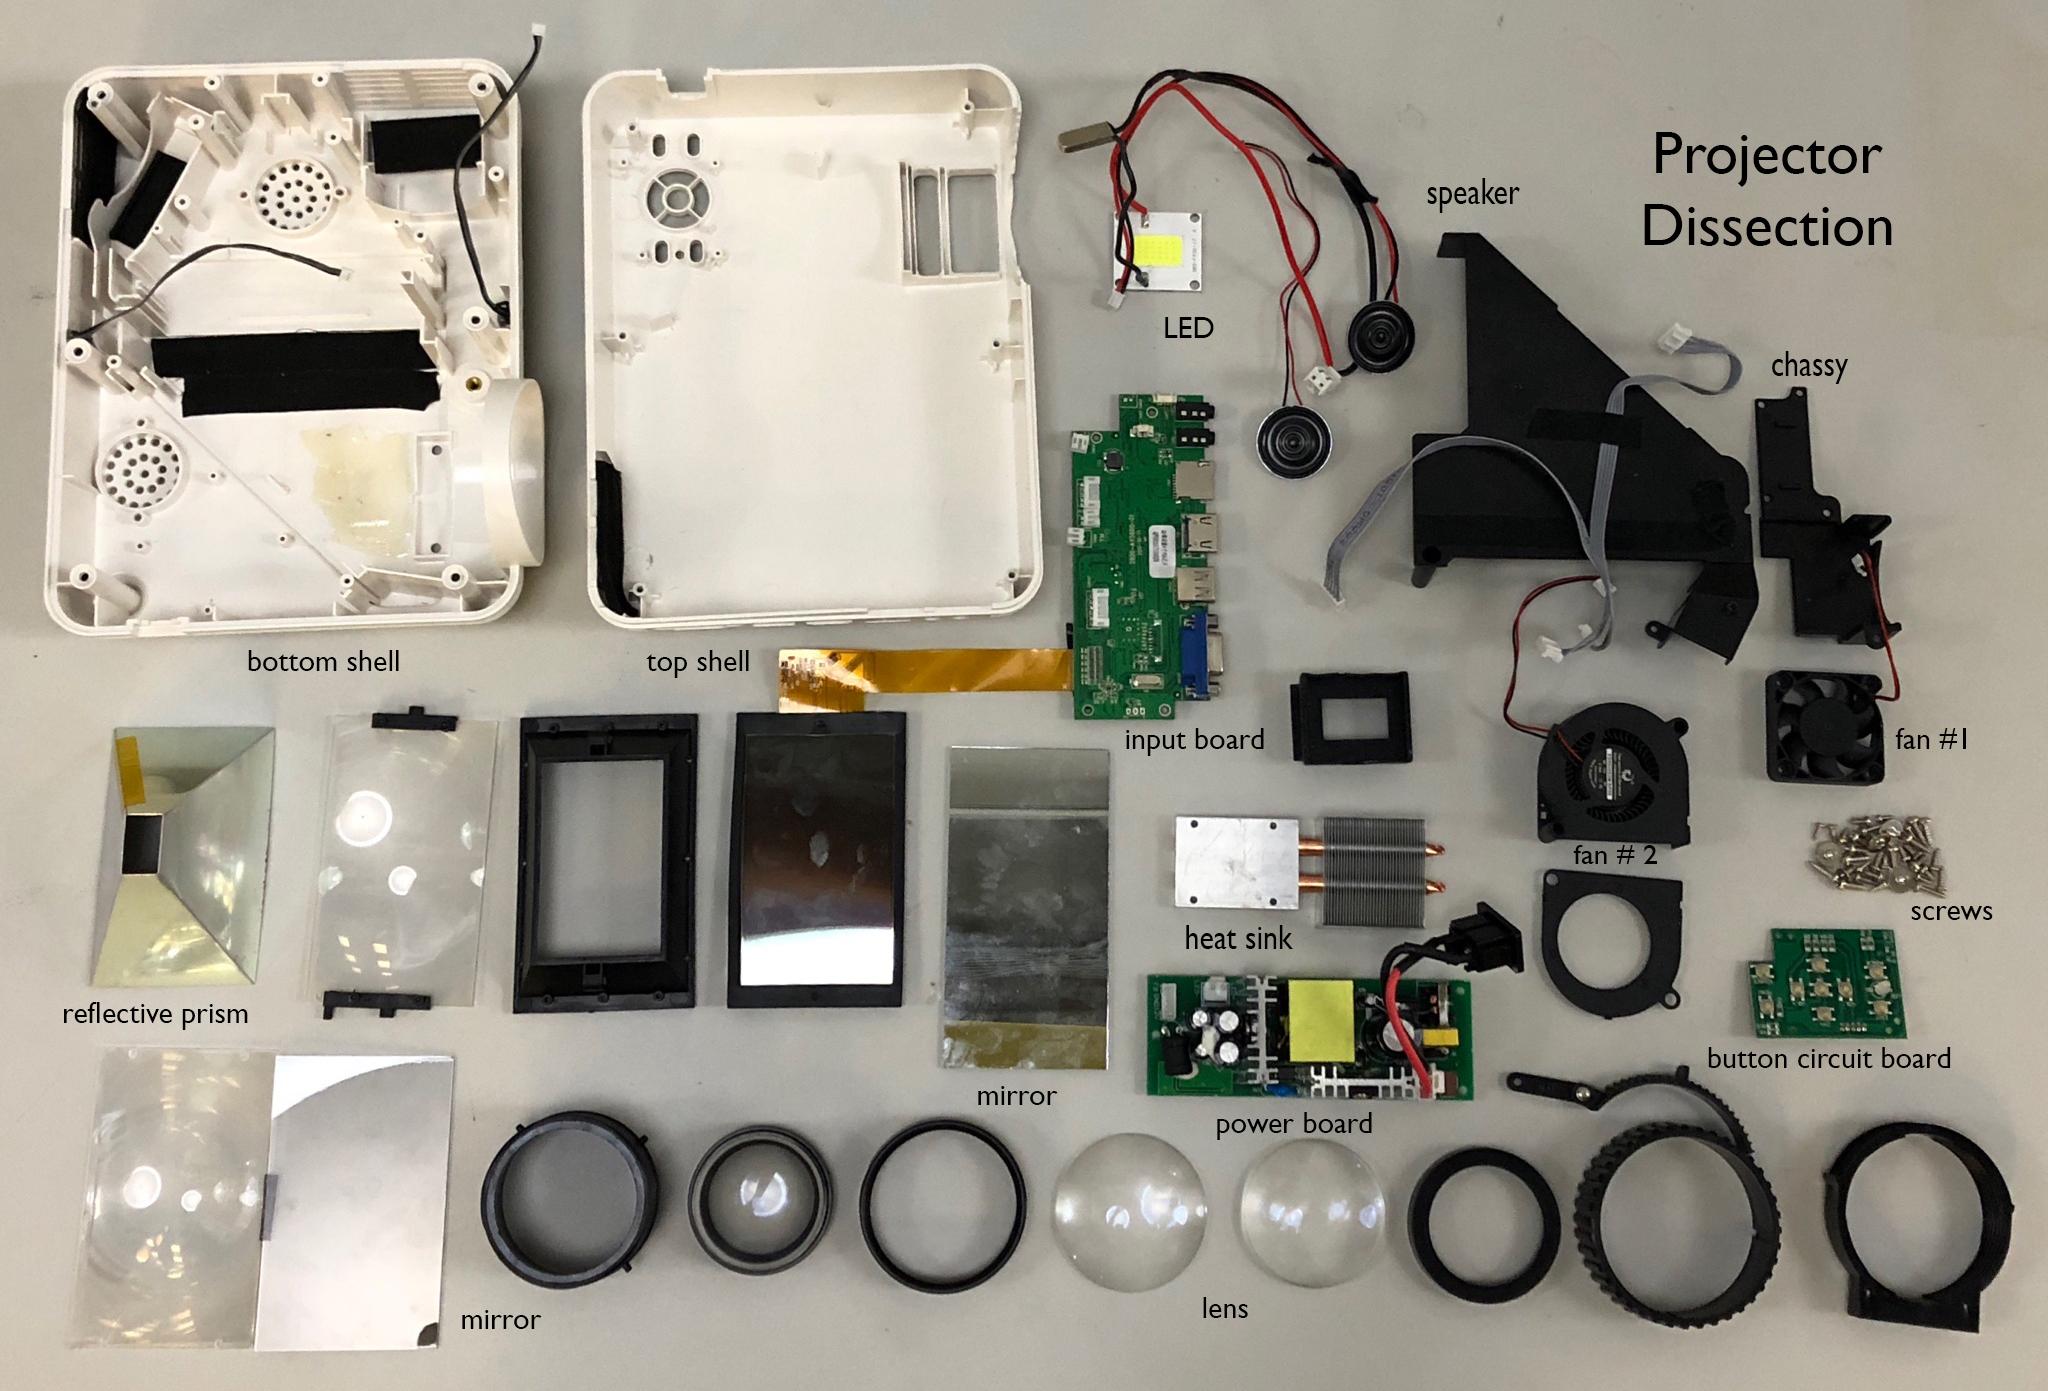 projector parts final .jpg